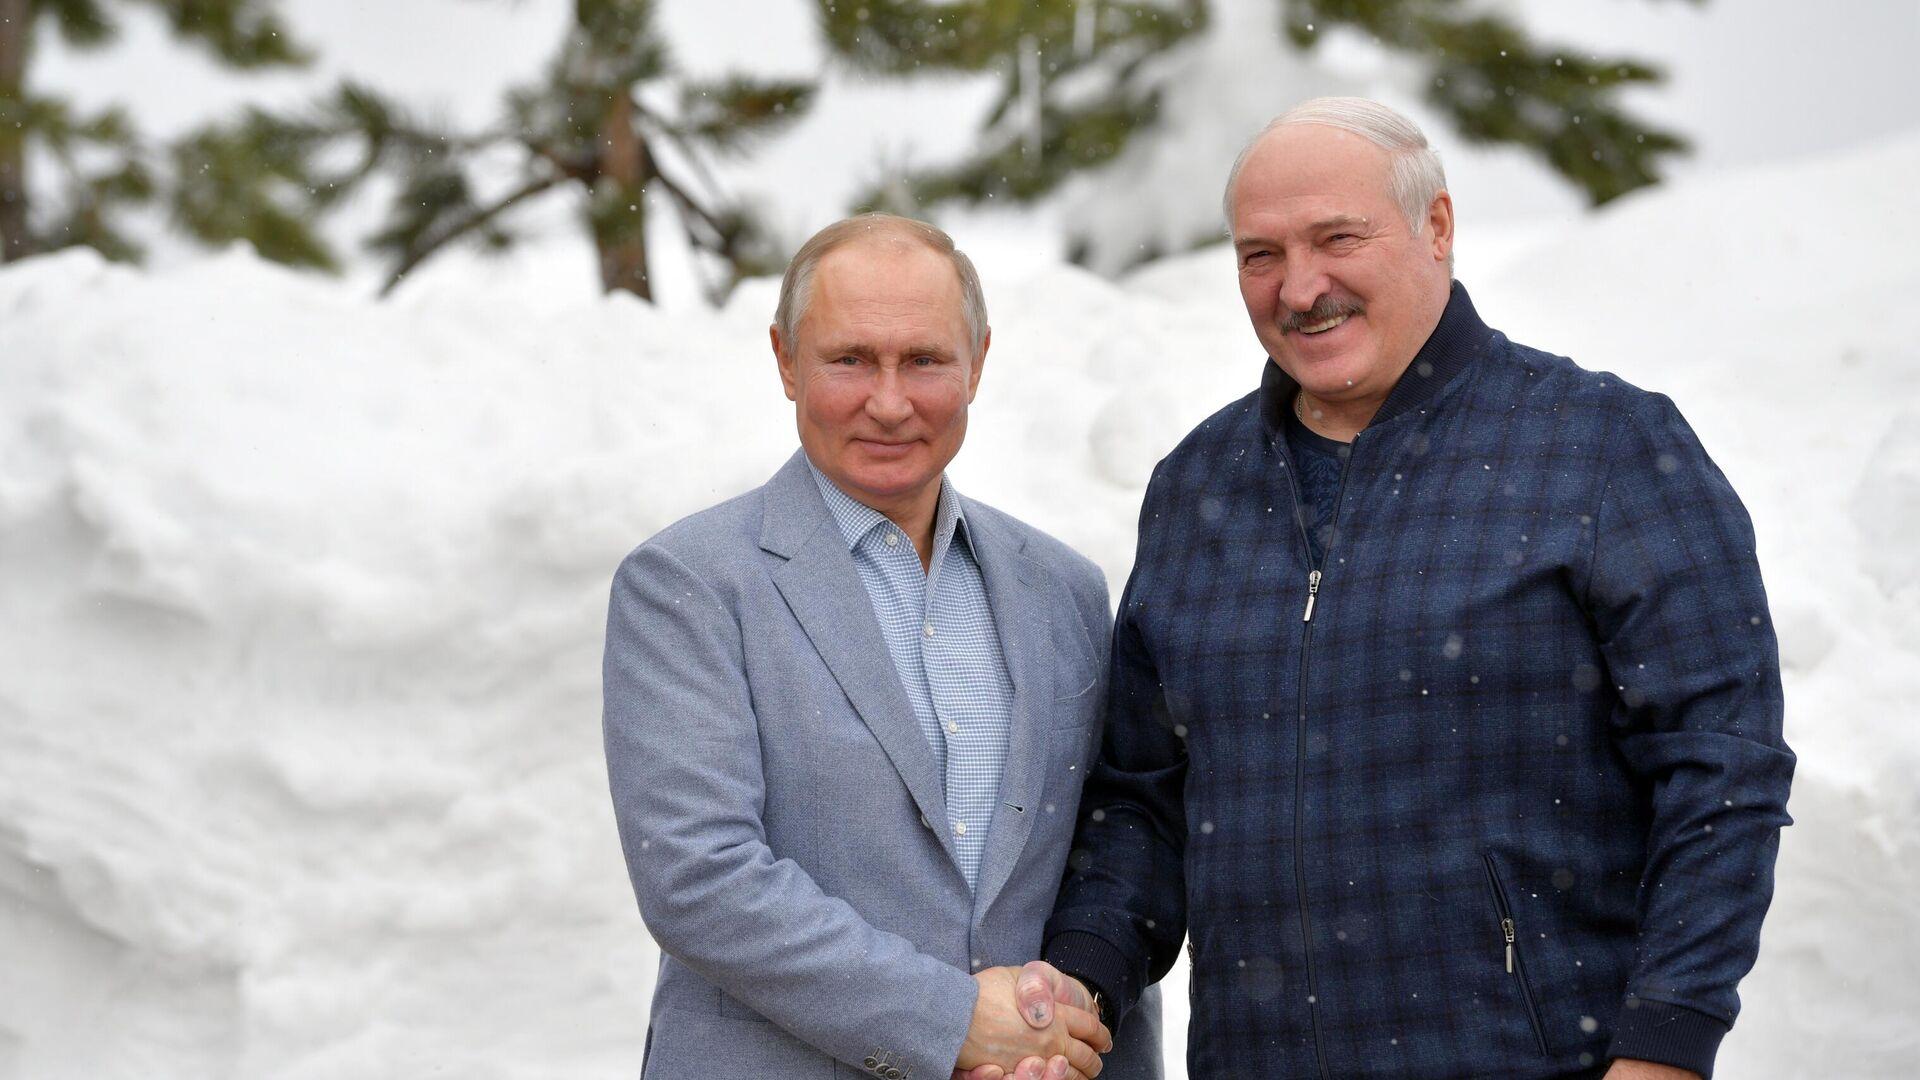 Президент РФ Владимир Путин и президент Белоруссии Александр Лукашенко (справа) во время встречи - РИА Новости, 1920, 22.02.2021